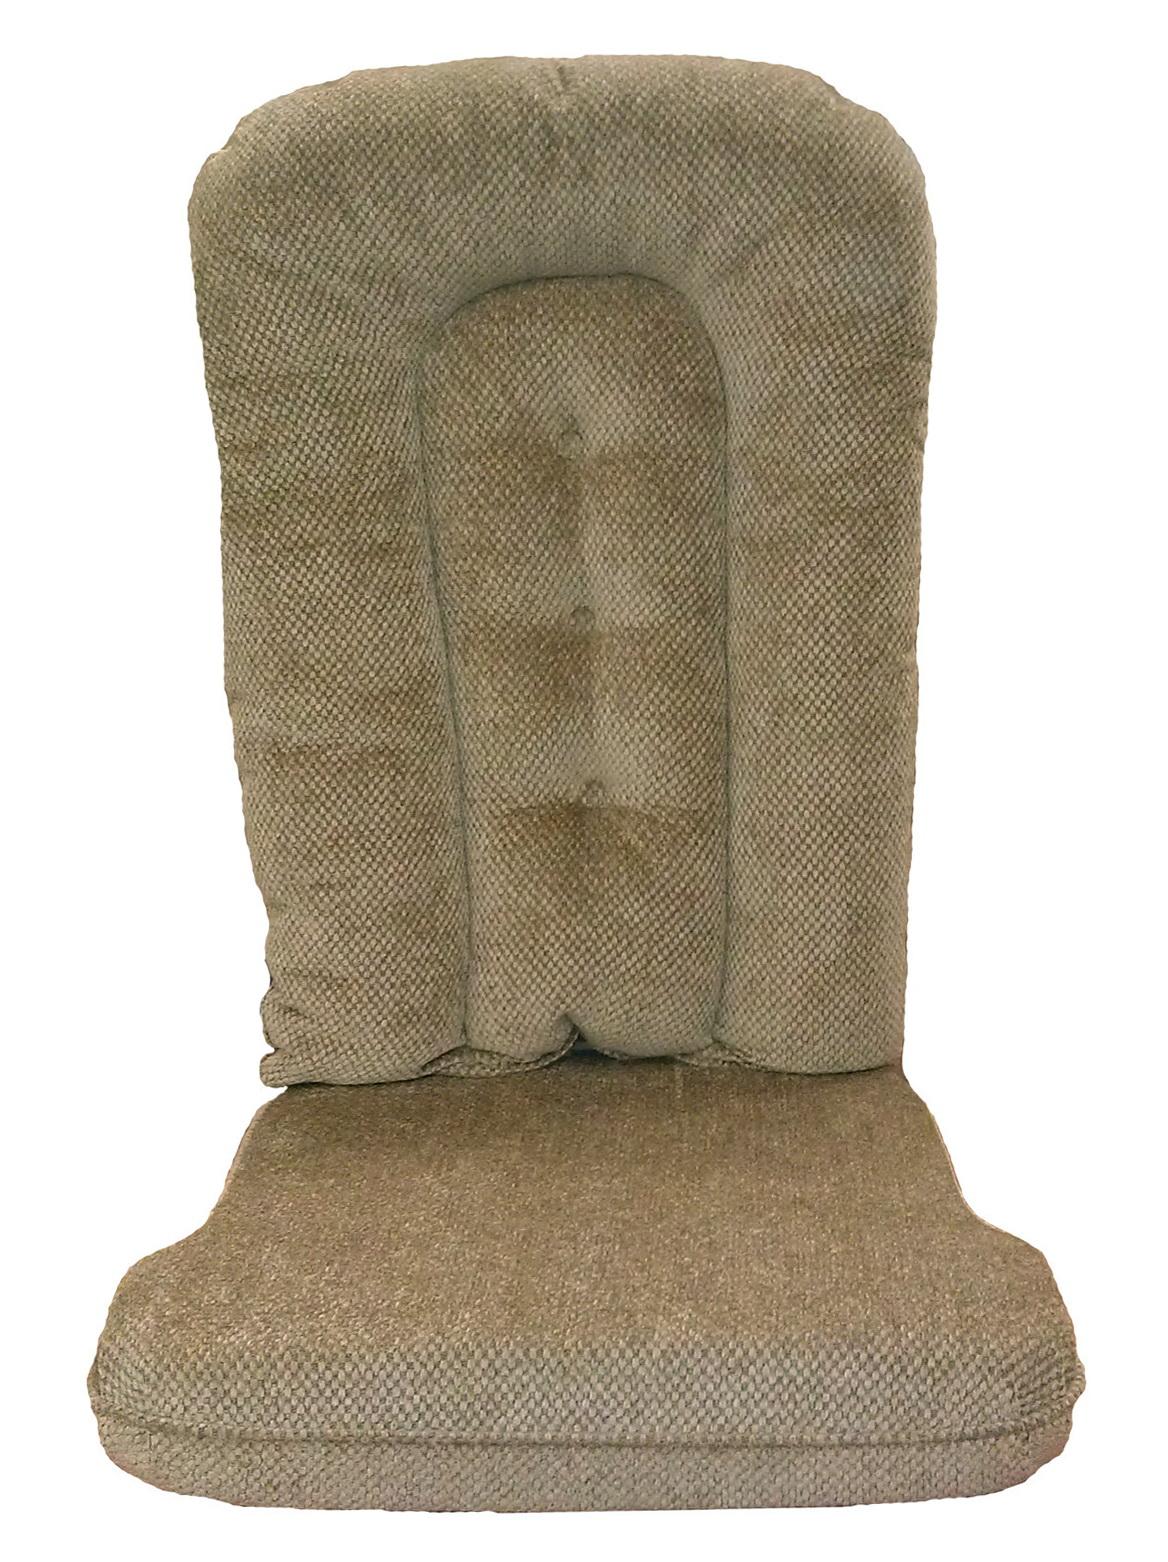 Hunting Seat Cushion Walmart Home Design Ideas